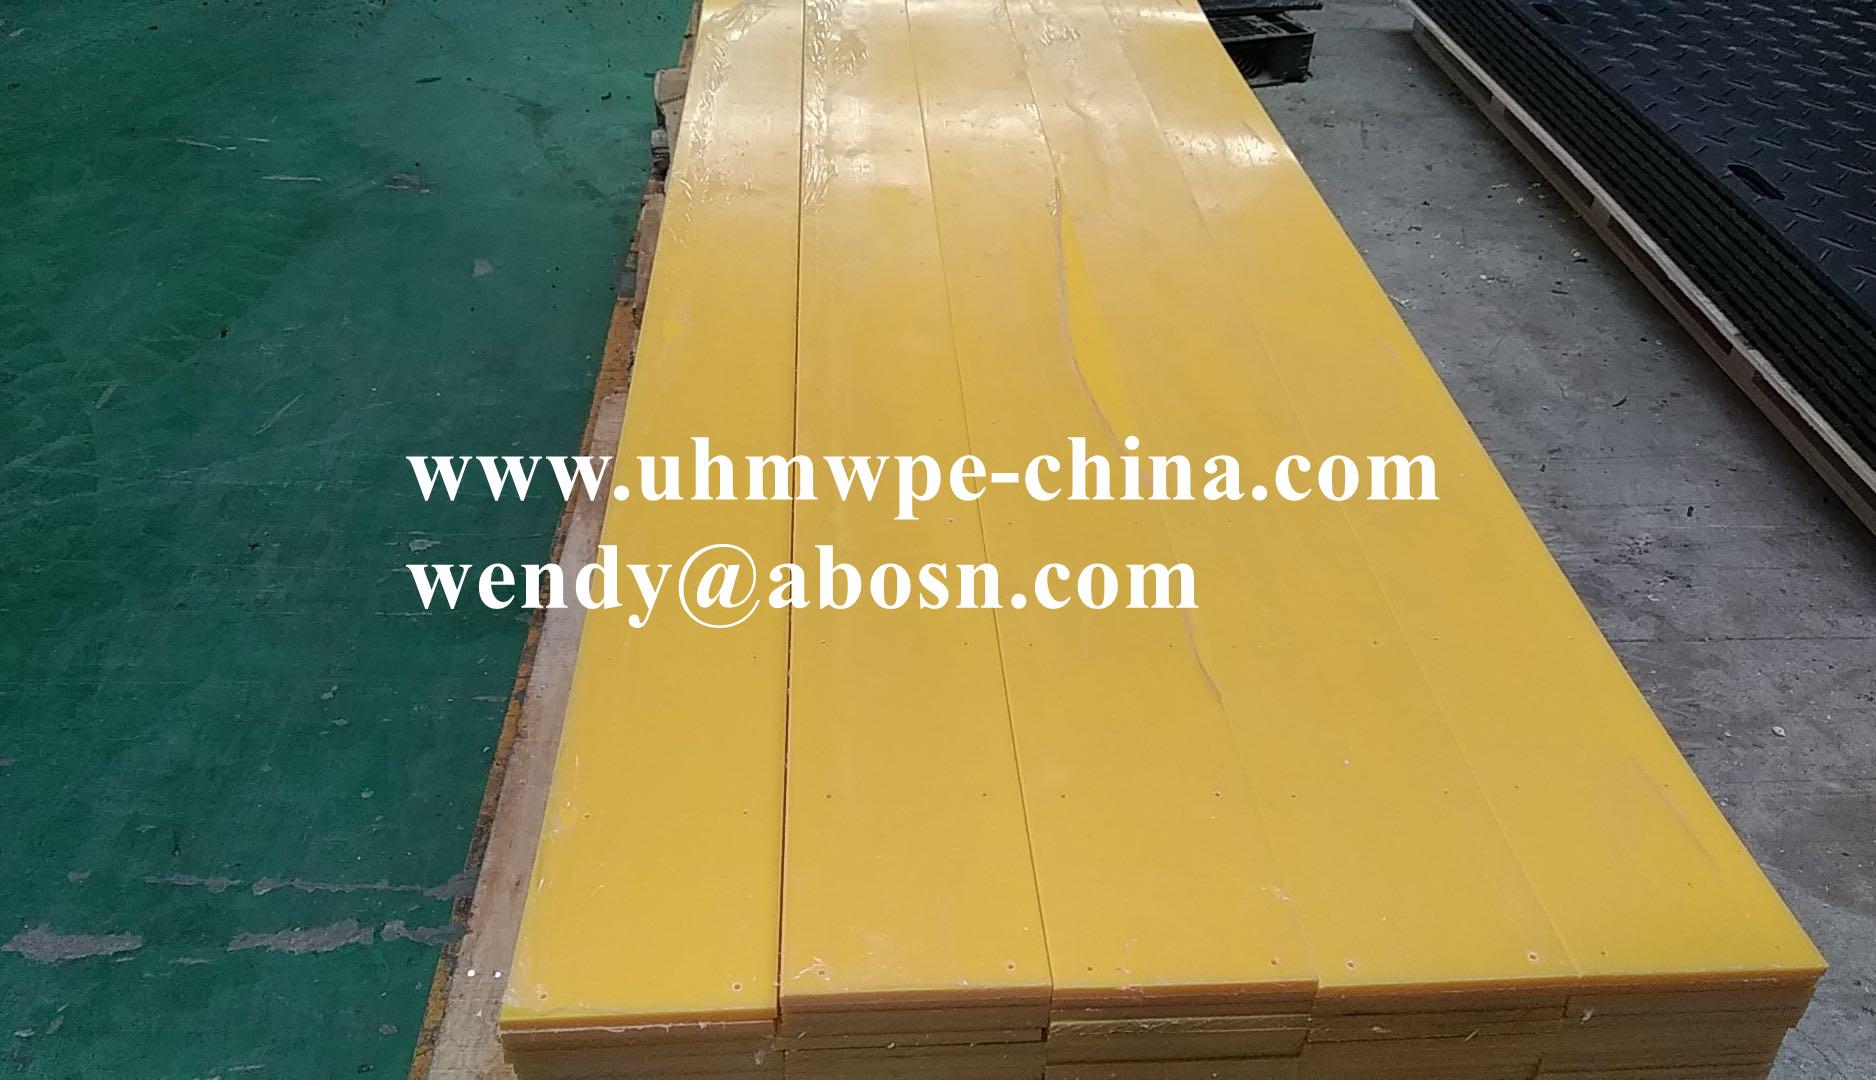 High Density Polyethylene HDPE Puck Board Sheet